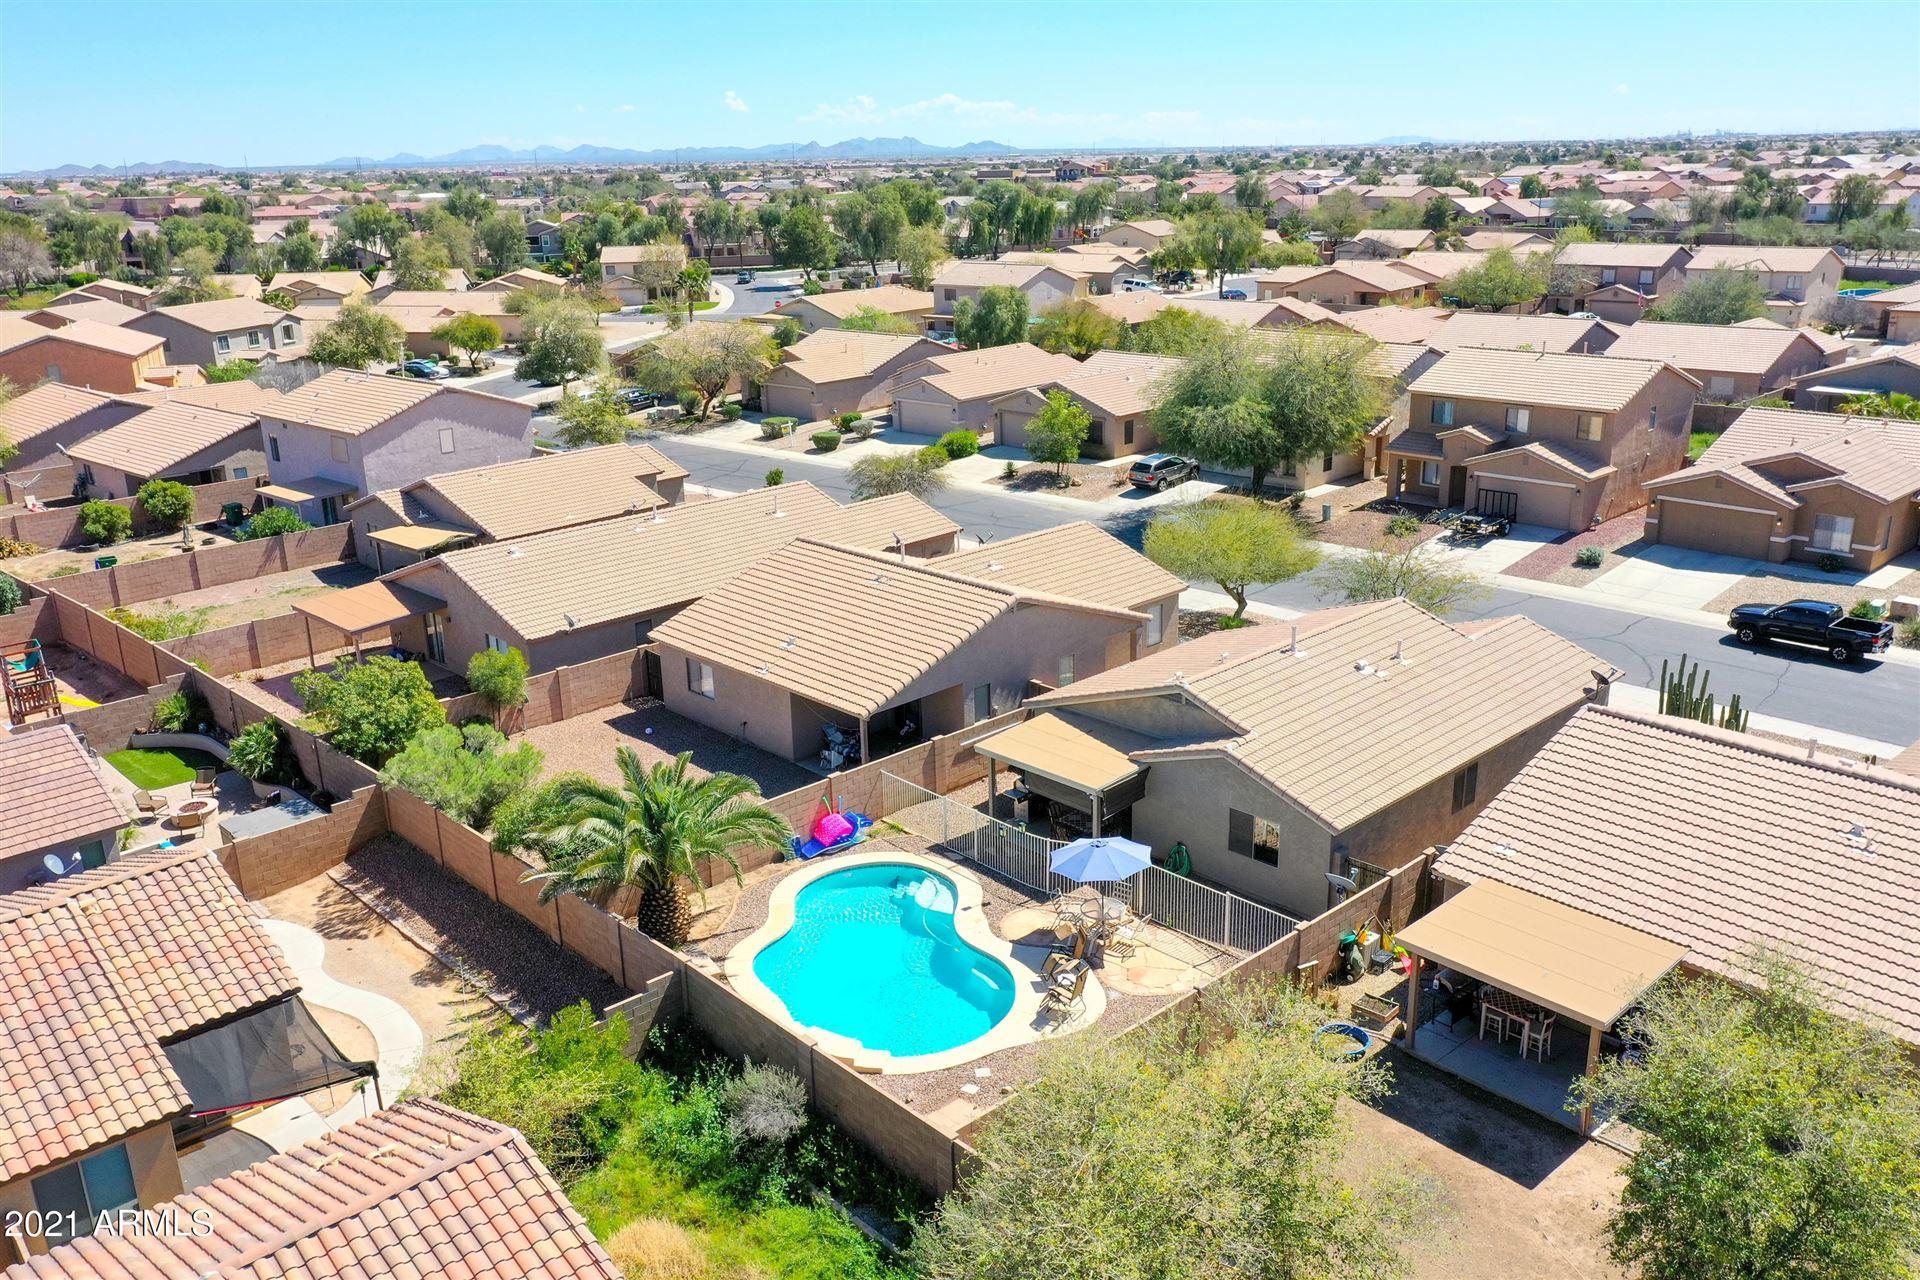 Photo for 43598 W COLBY Drive, Maricopa, AZ 85138 (MLS # 6179619)